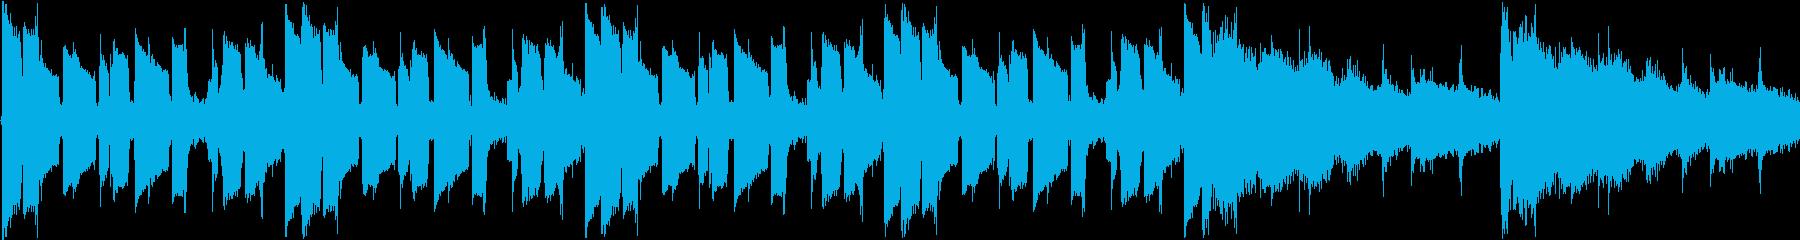 【JAZZギターソロ】の再生済みの波形